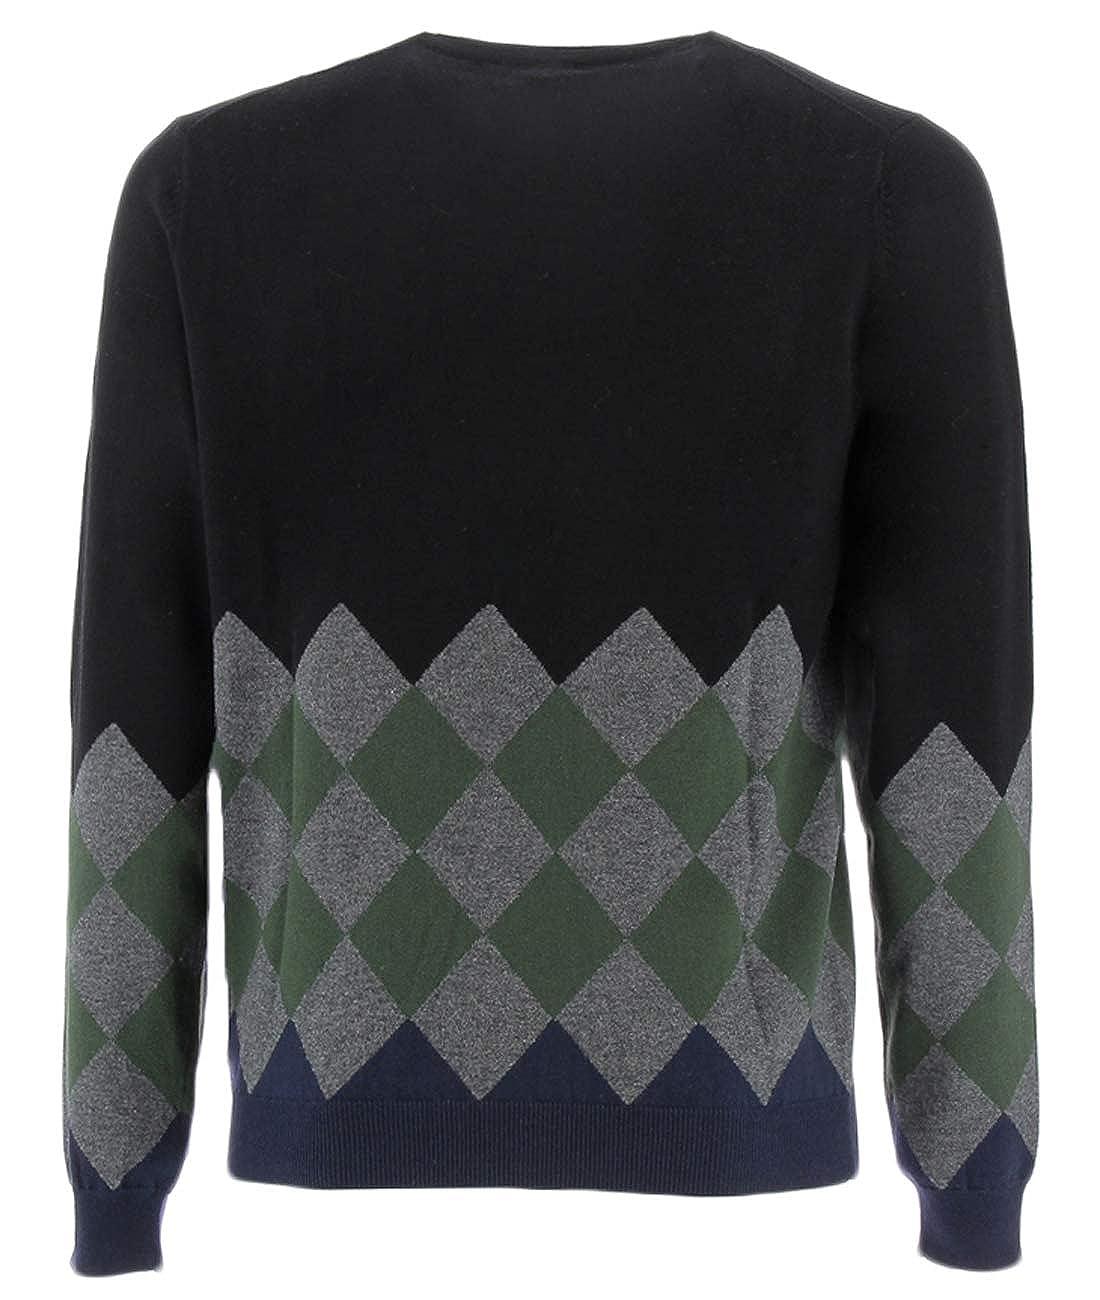 SUN68 Black Sweater with Rhombuses